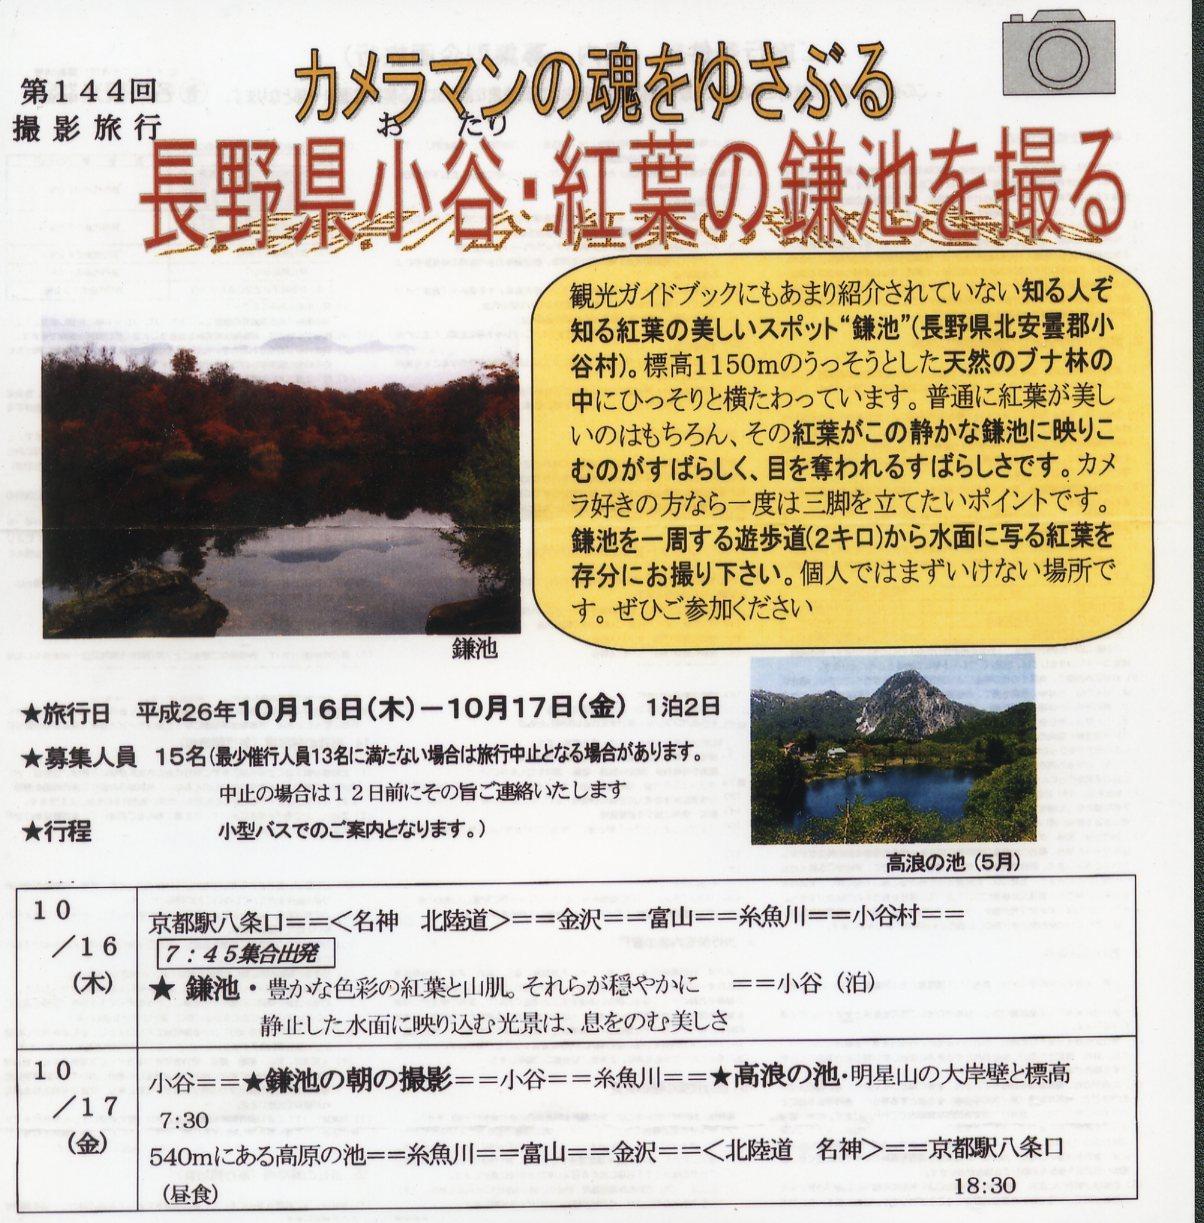 長野県小谷・紅葉の鎌池_e0180612_10253323.jpg